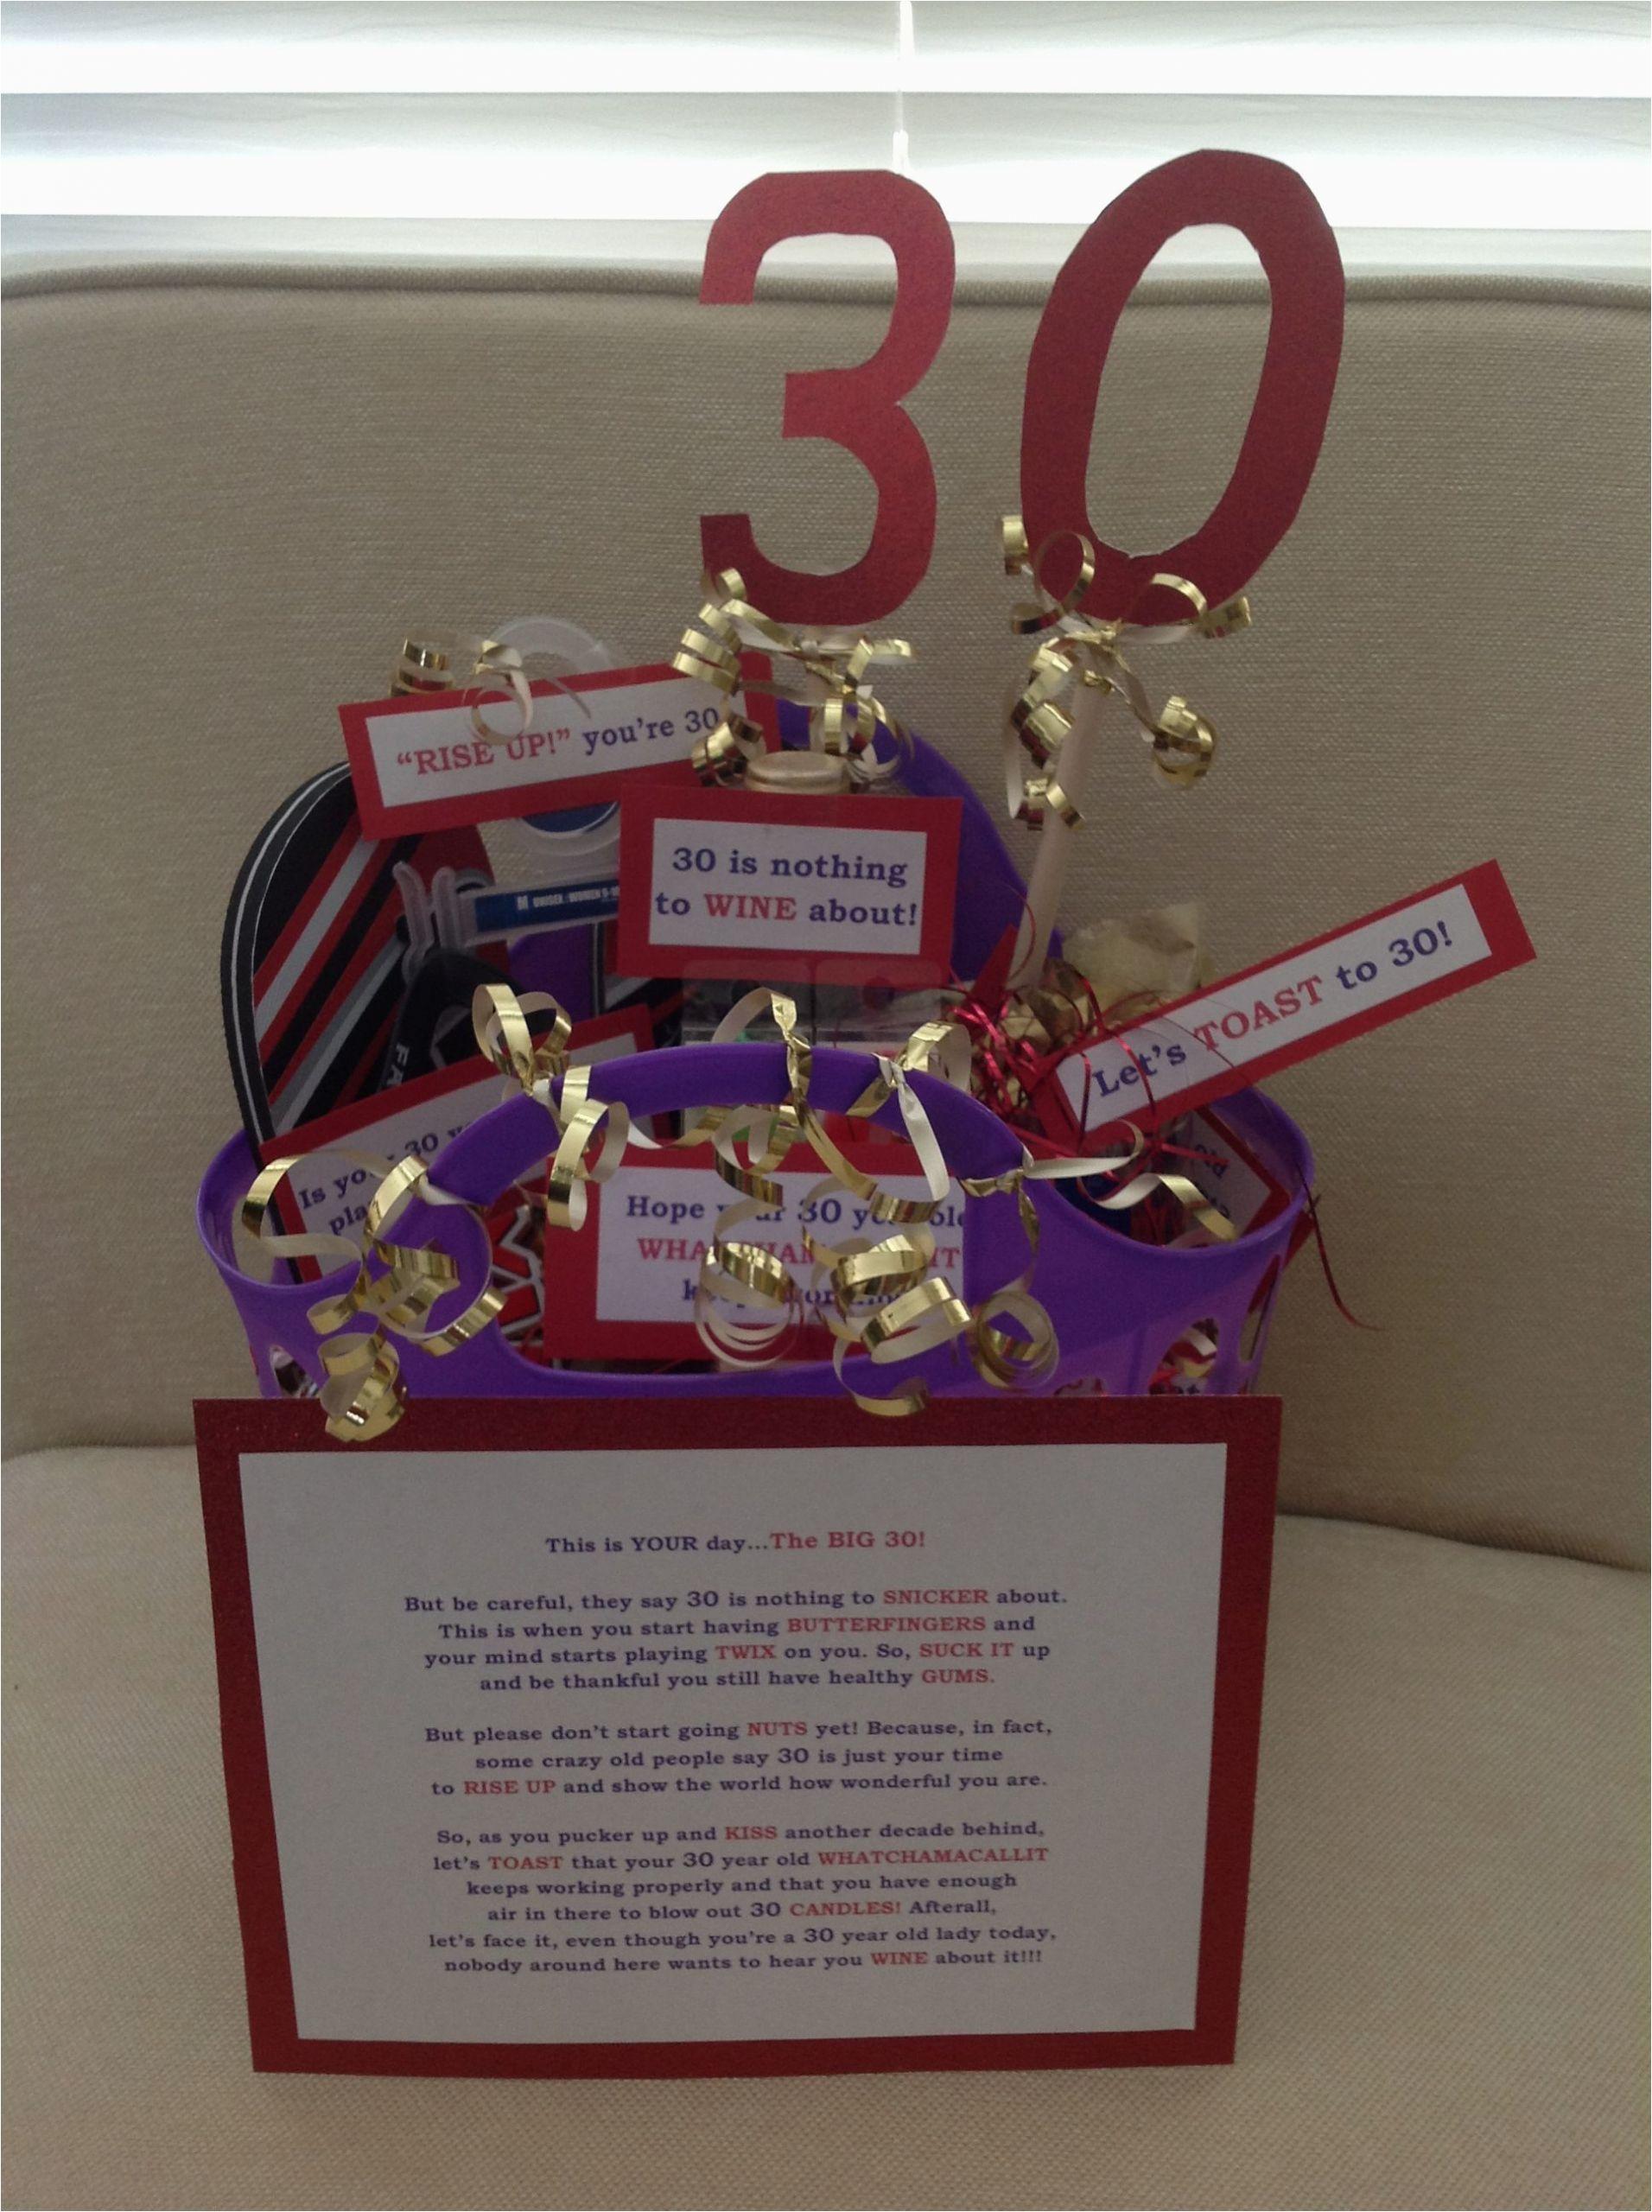 Best 30th Birthday Gifts for Boyfriend 30th Birthday Gift Basket Easy Diy and so Fun Gifts